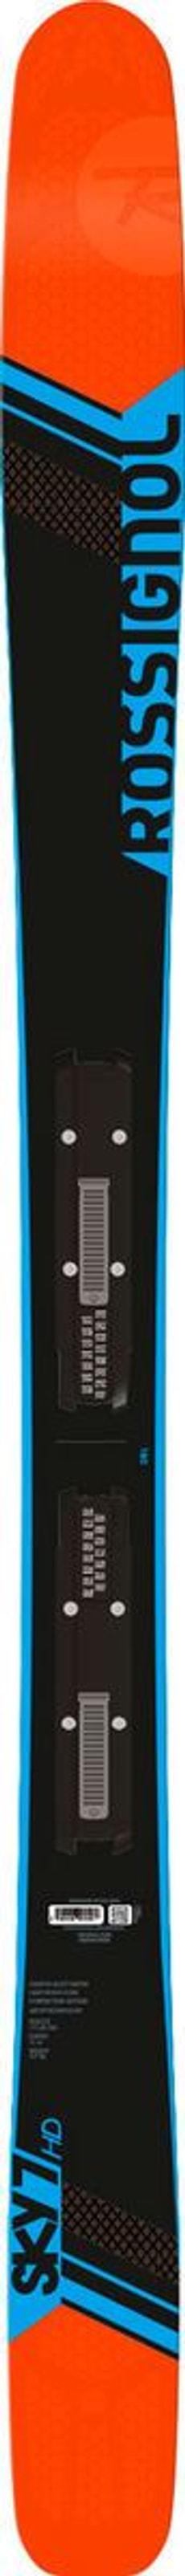 Sky7 HD inkl. NX 12